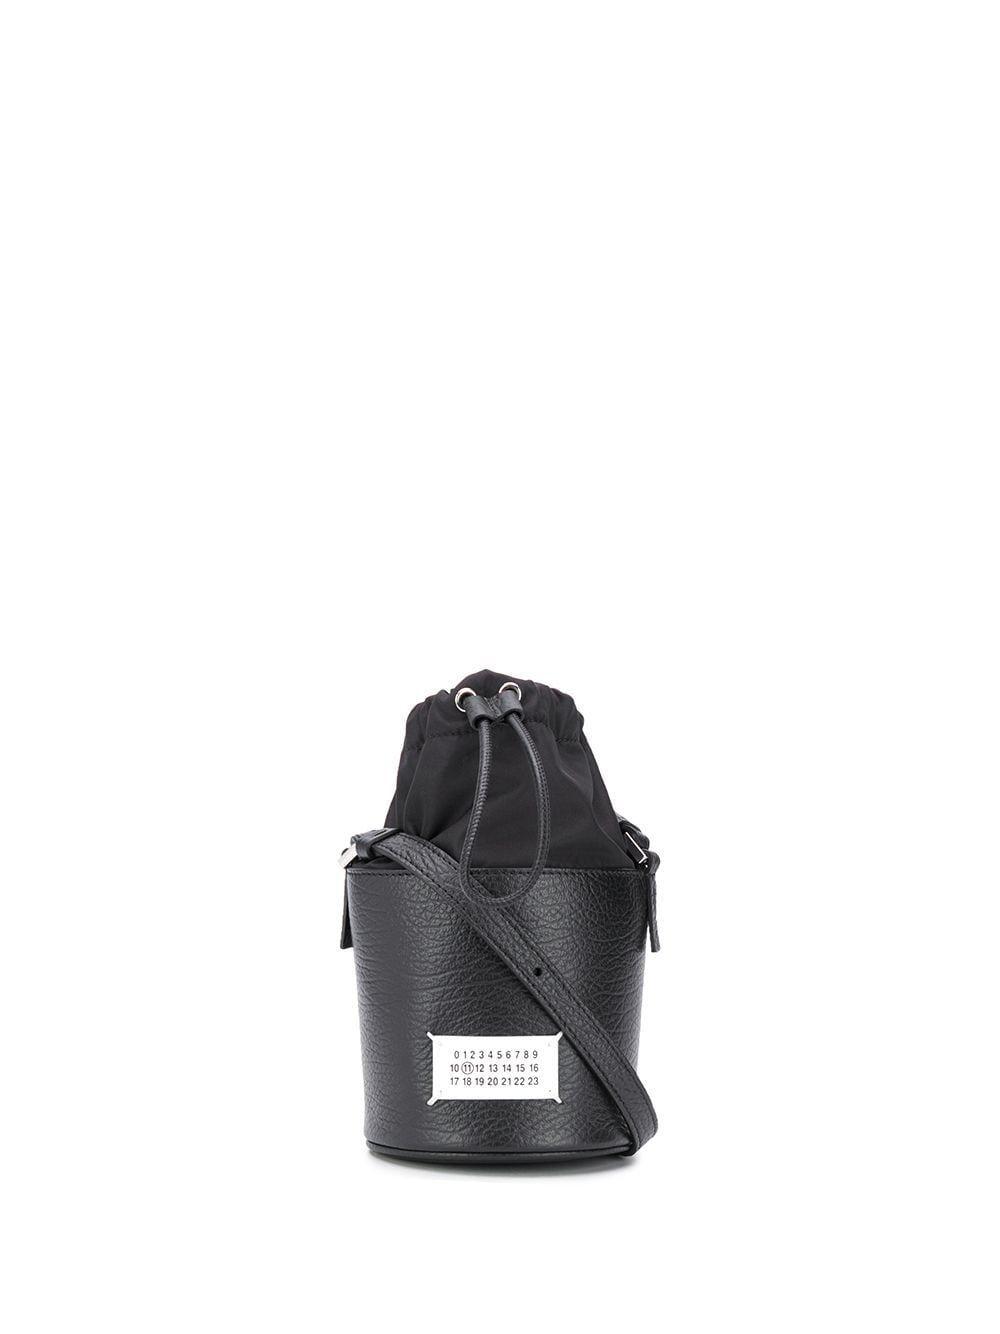 MAISON MARGIELA WOMEN'S S56WG0164P0396H7735 BLACK LEATHER SHOULDER BAG